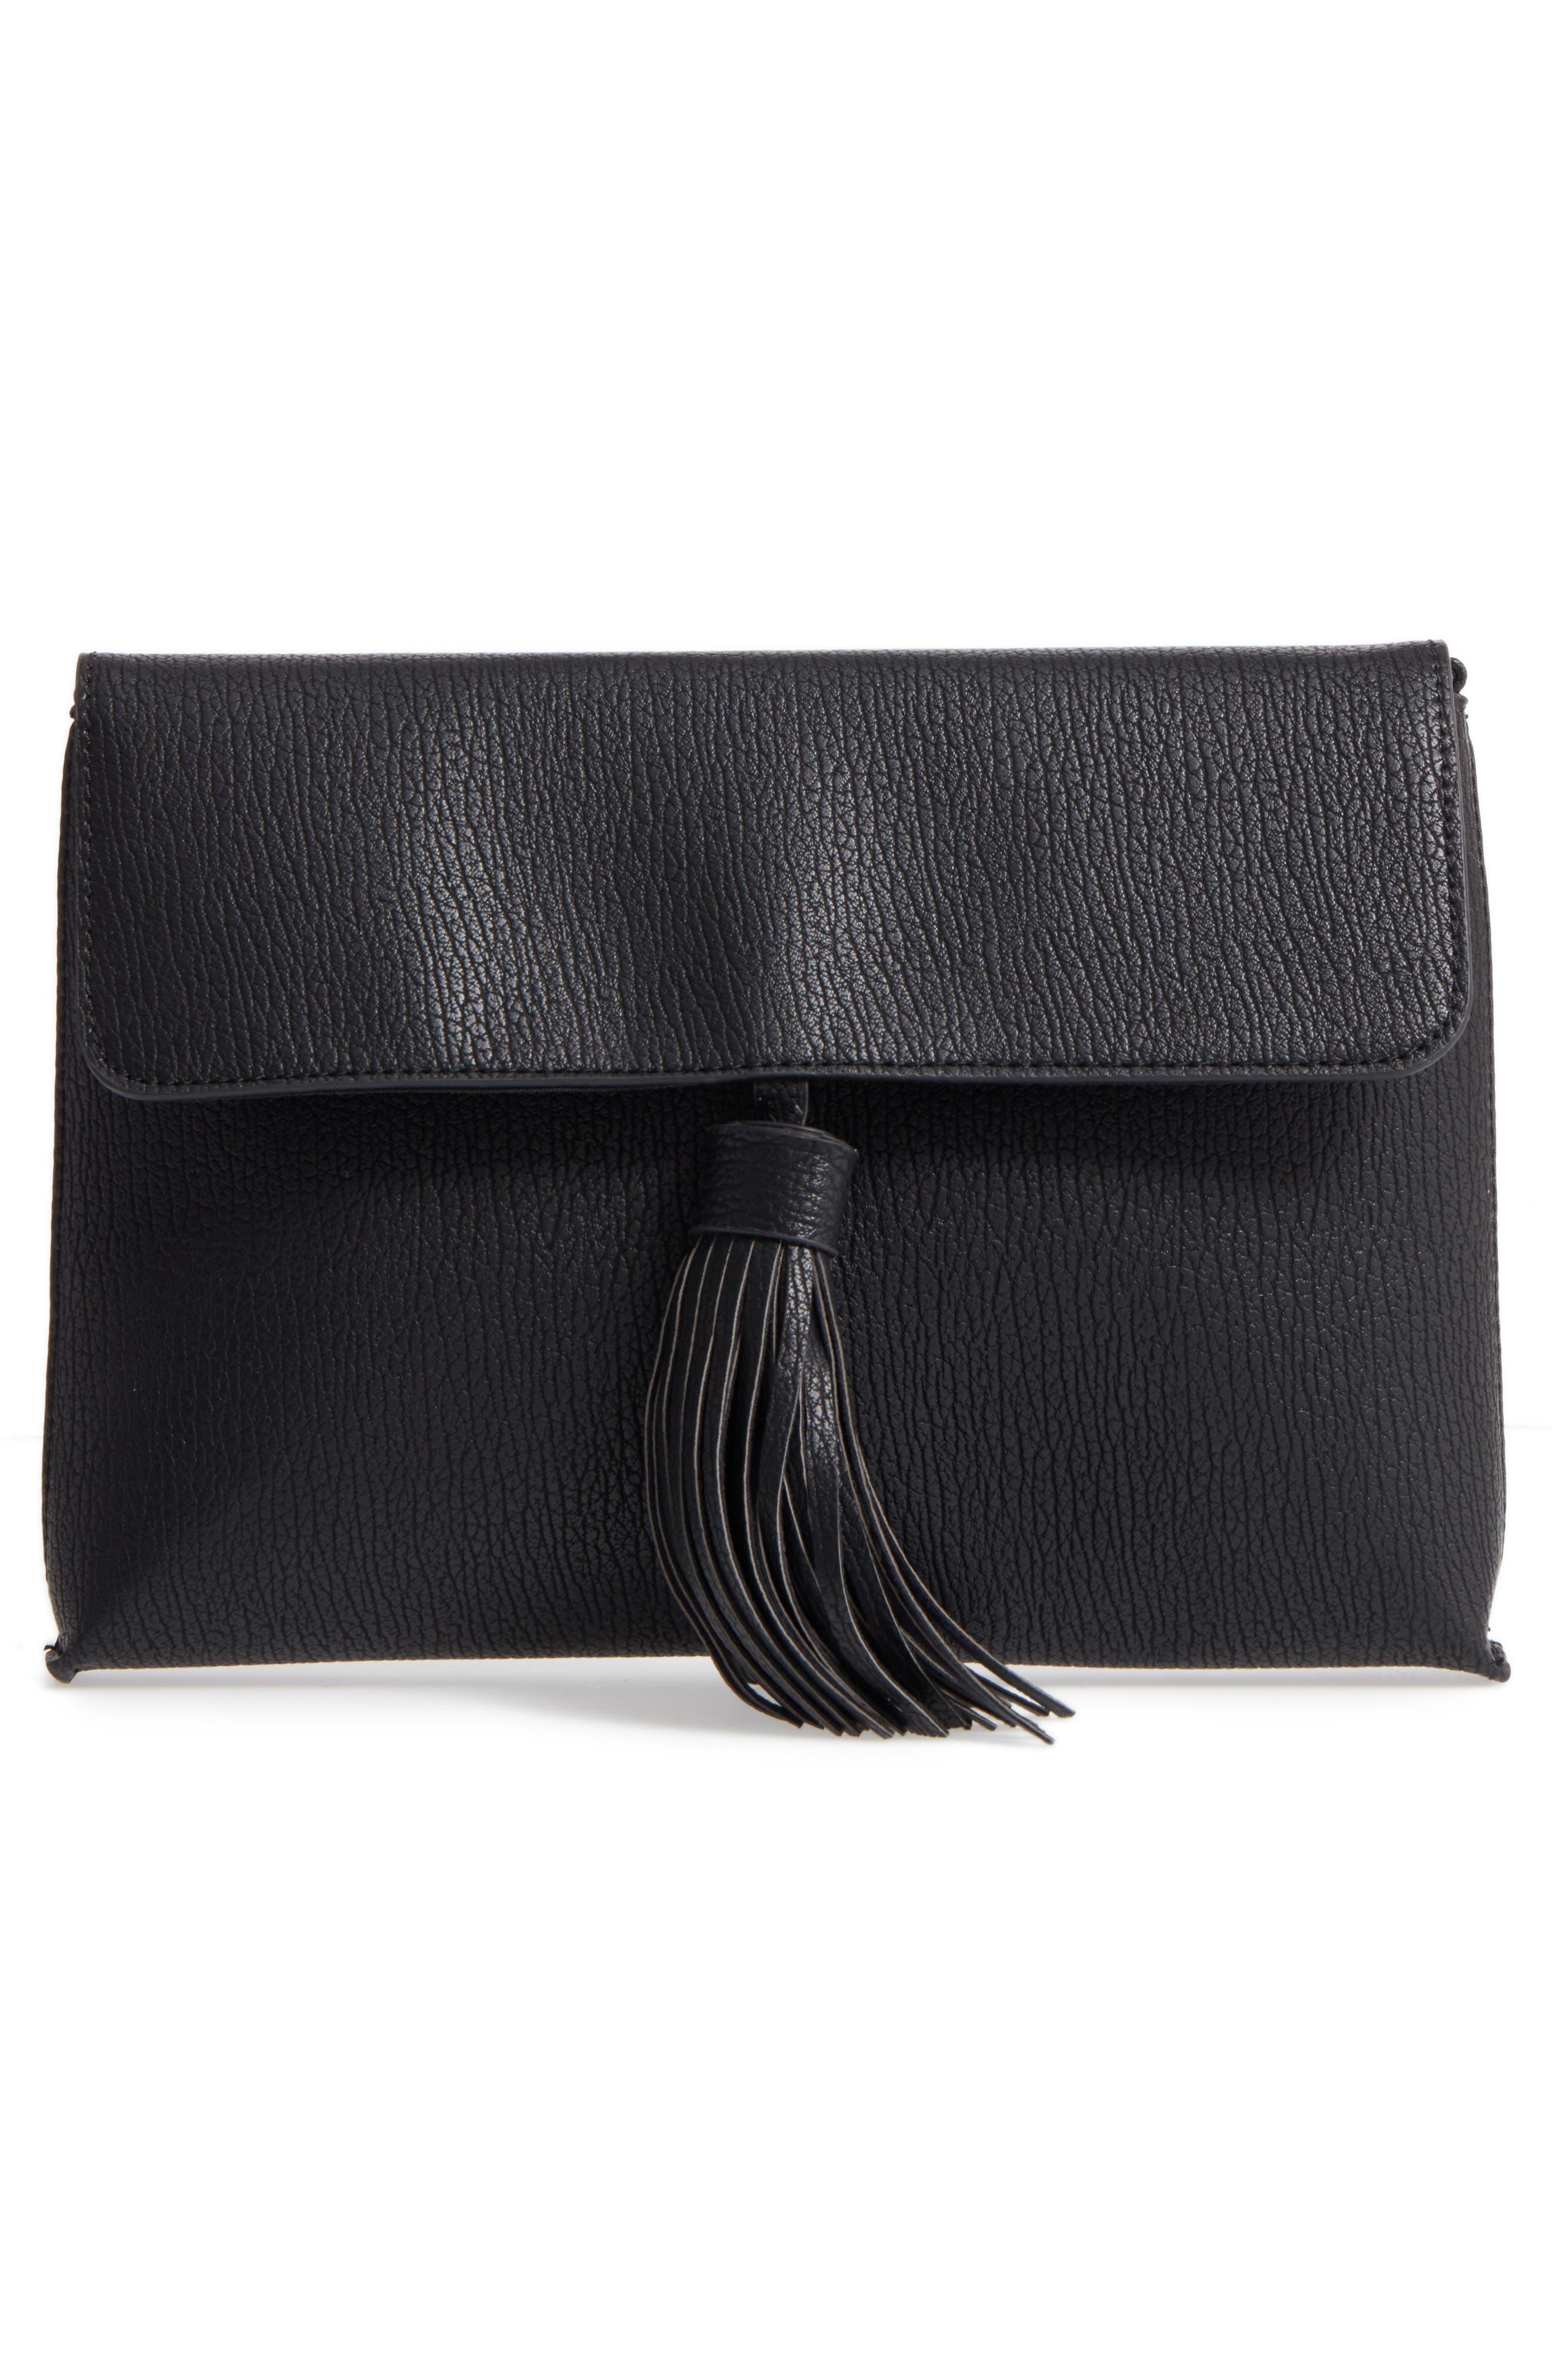 Divya Faux Leather Convertible Clutch,                             Alternate thumbnail 4, color,